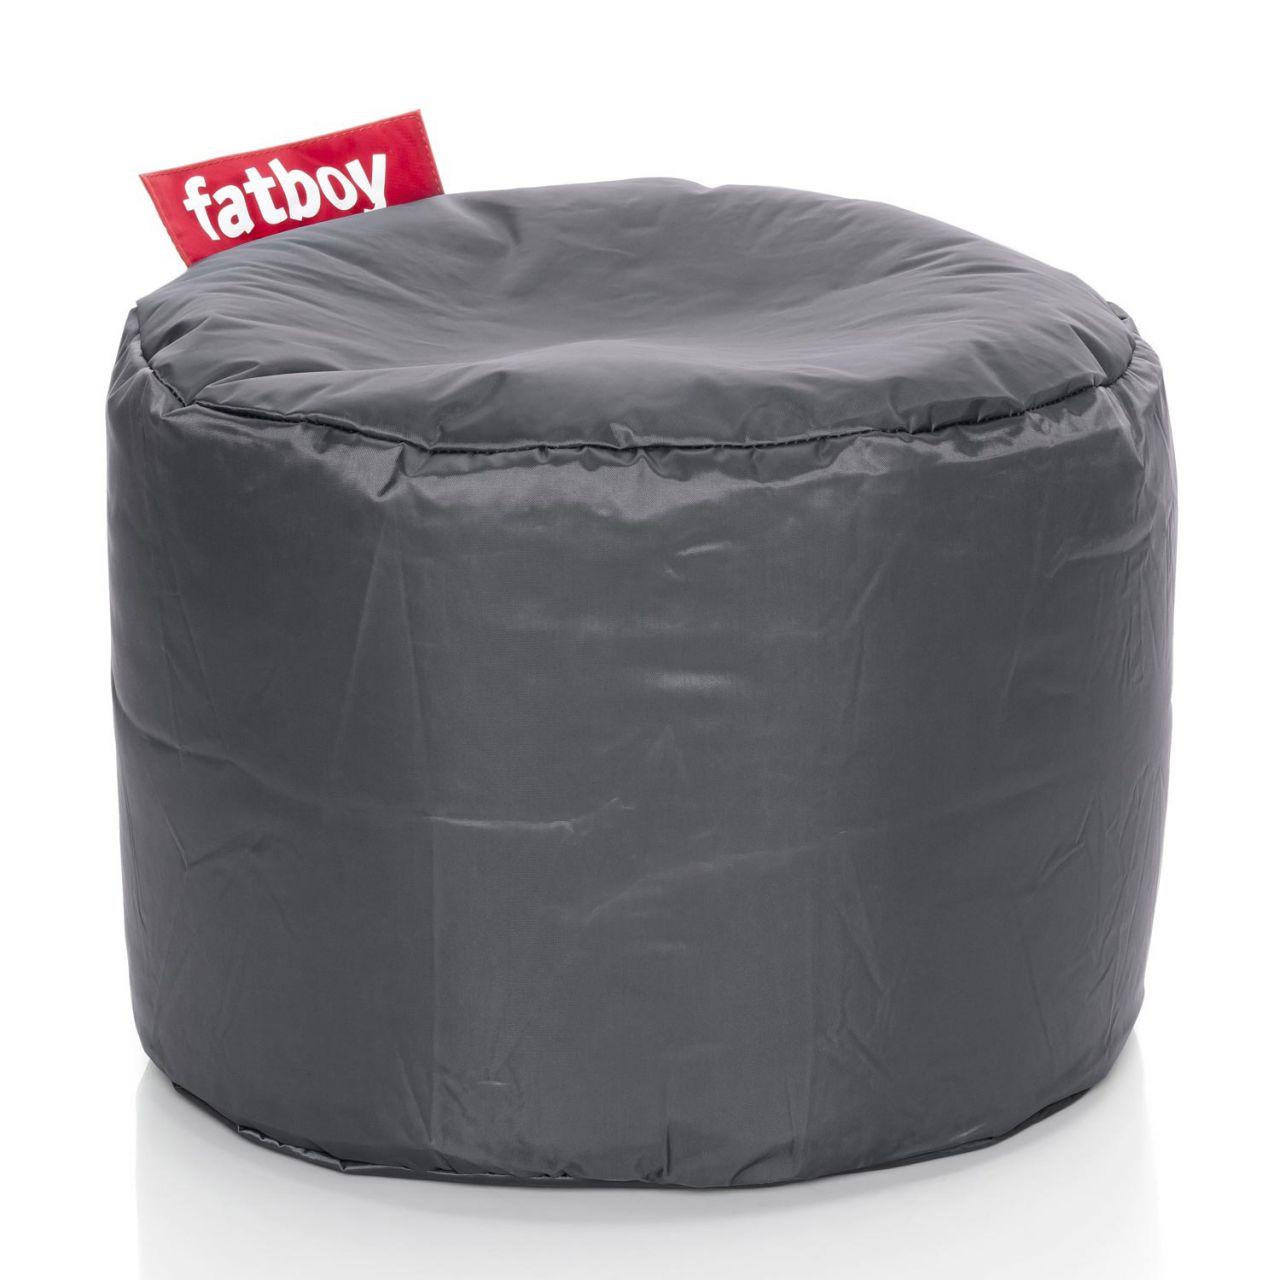 Fatboy - Point Sitzhocker 900.0035